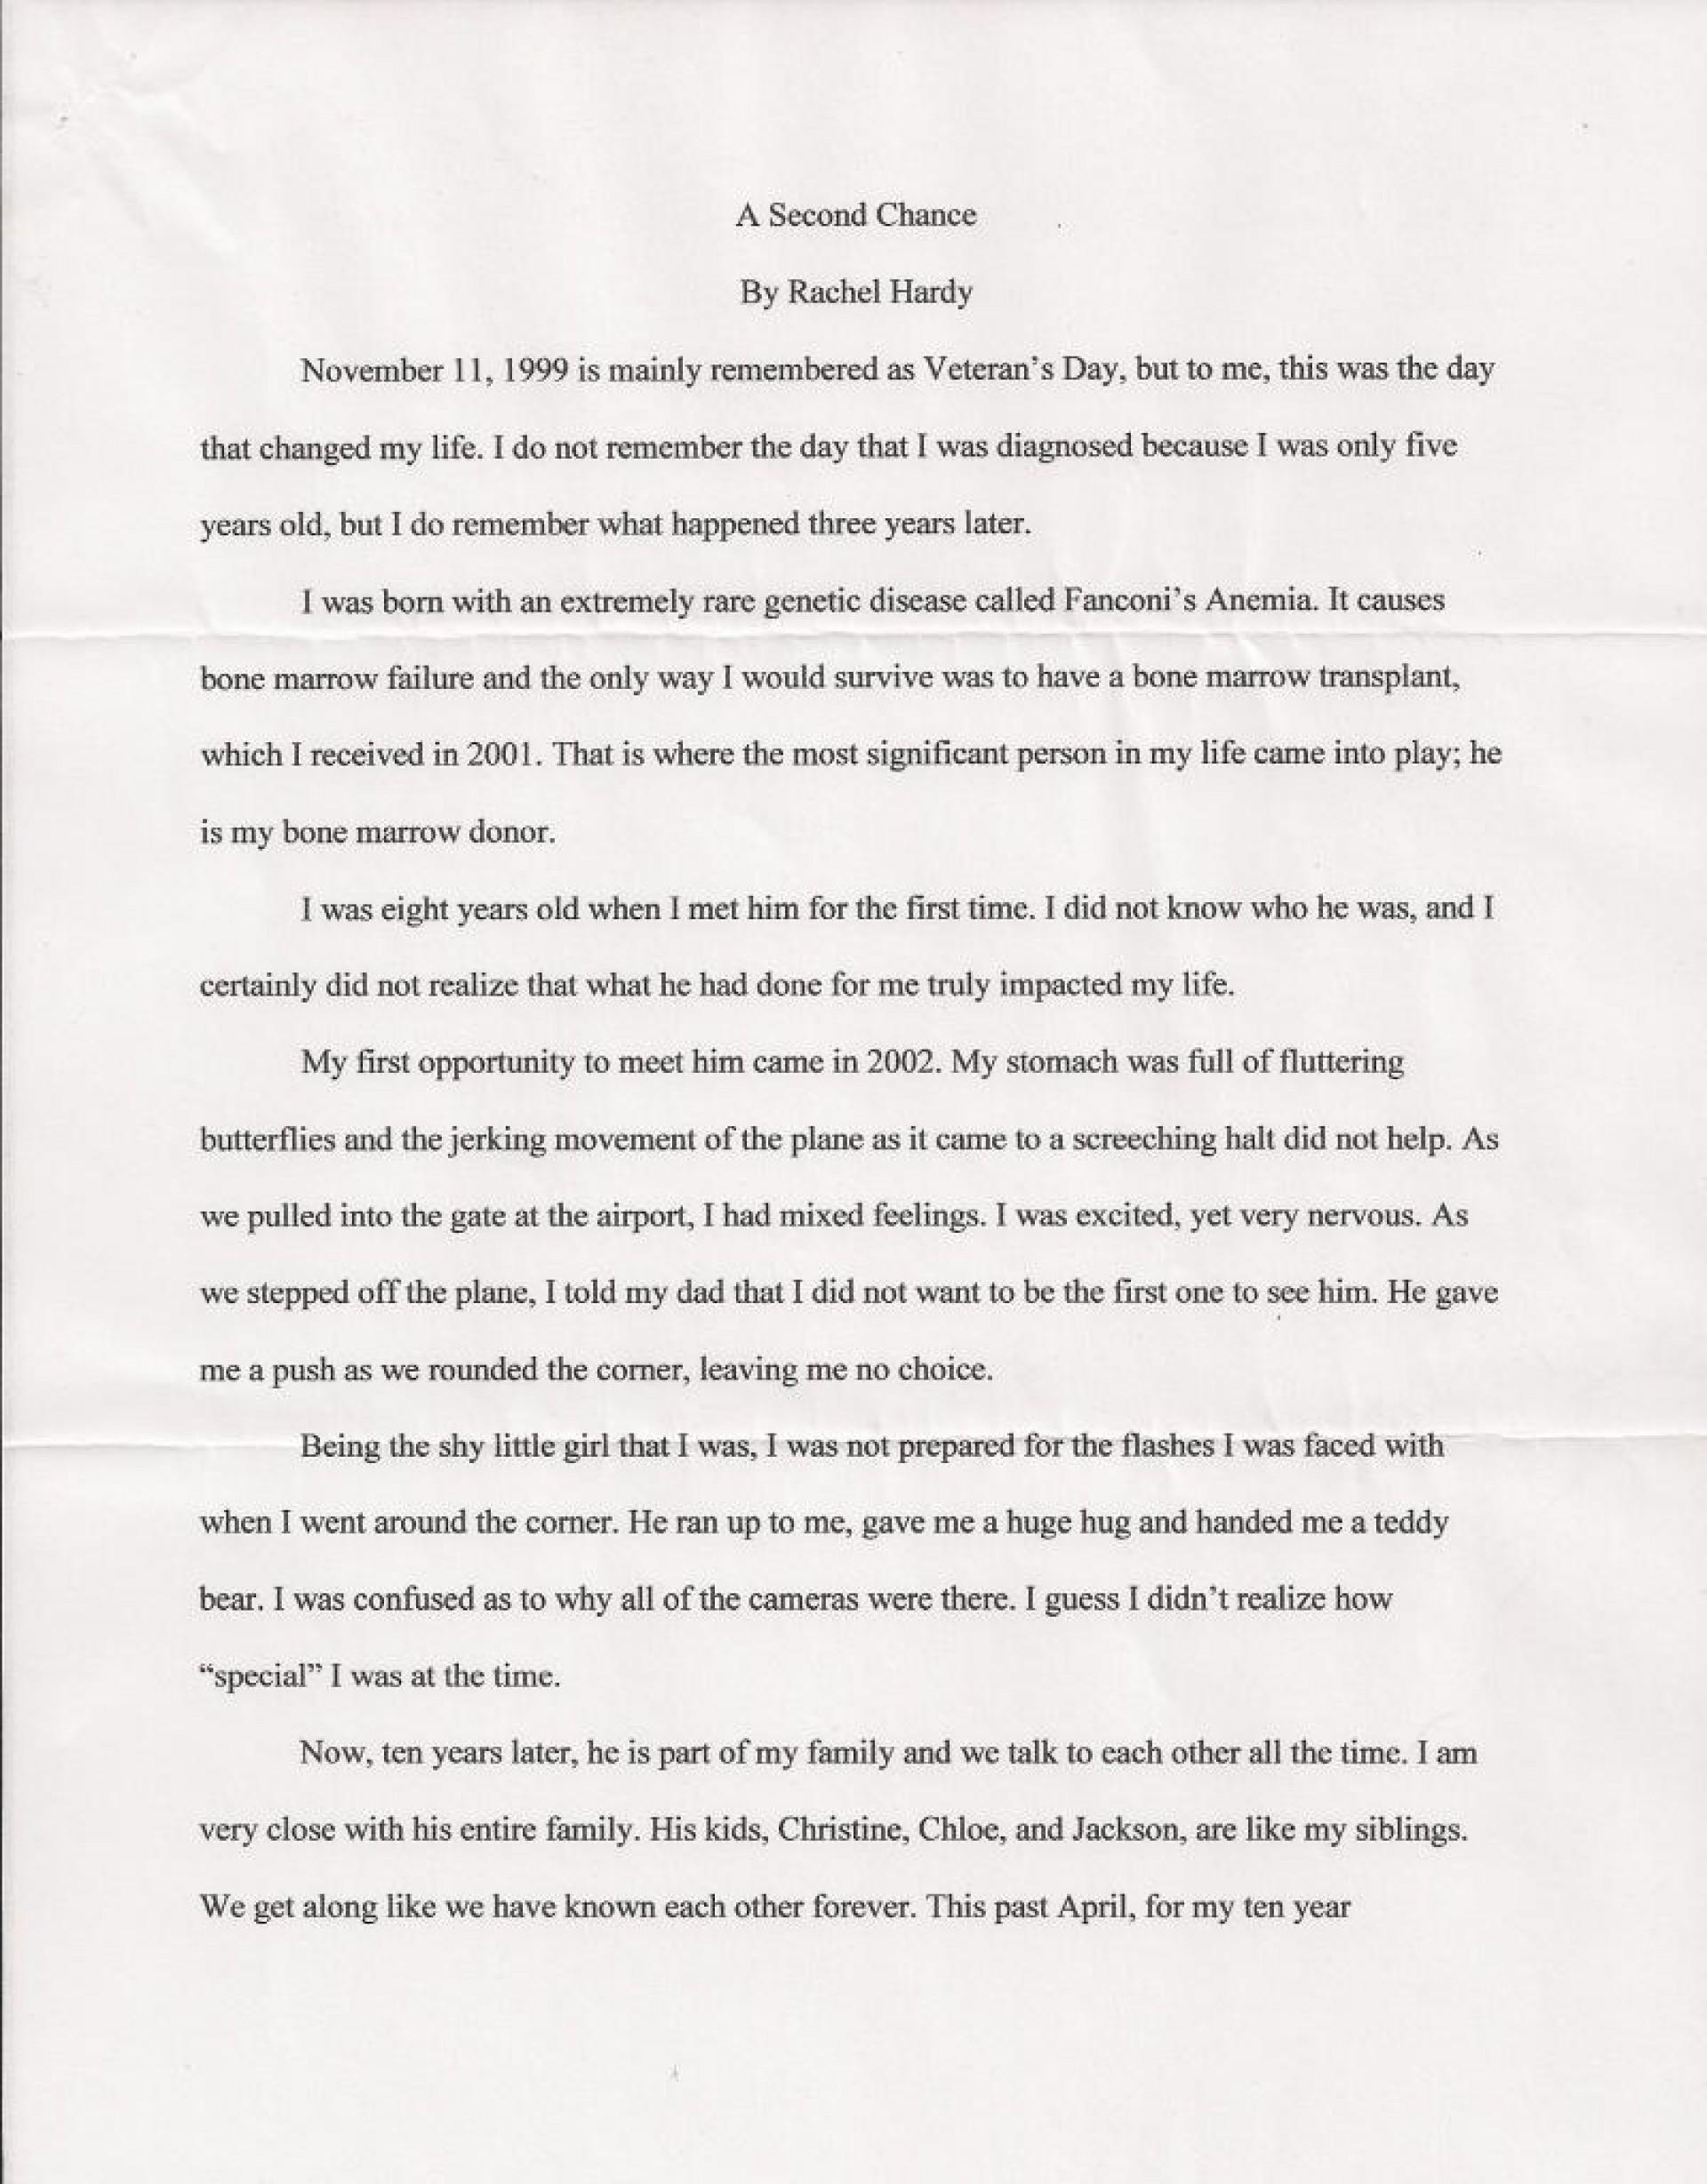 010 Essay Example Rachel Hardy 1 206151151 Std Scholarship Stunning Sample Leadership For Mba 1920